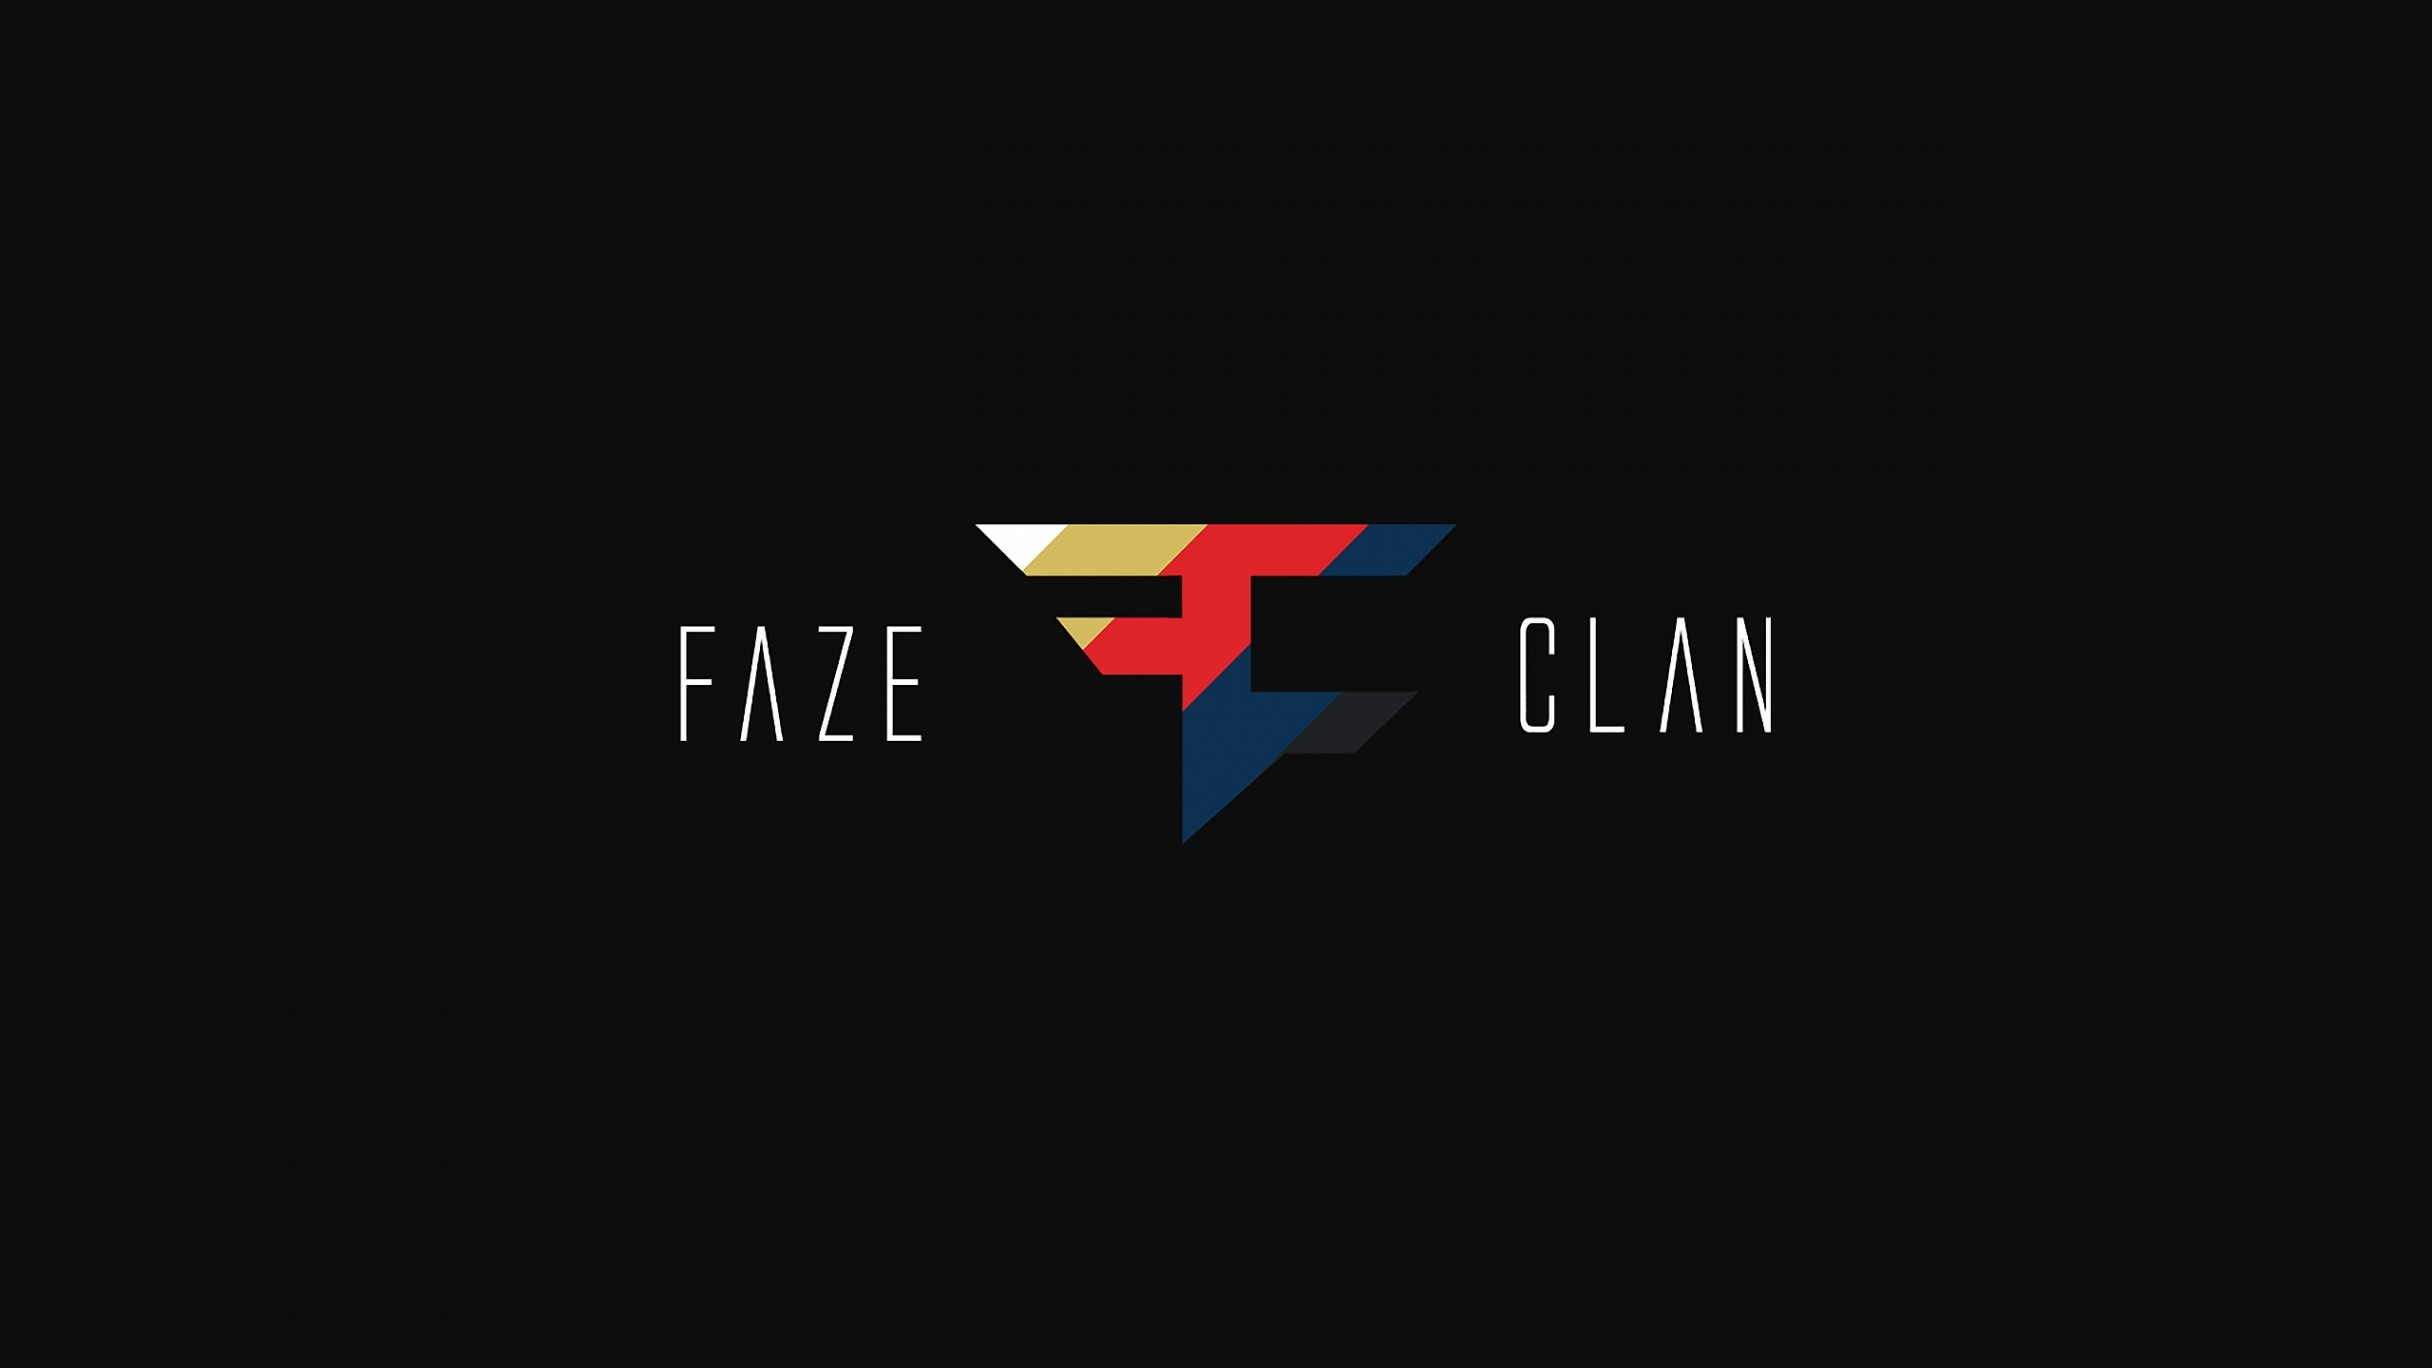 Faze Clan Wallpaper Pack V4 86 images 2432x1368